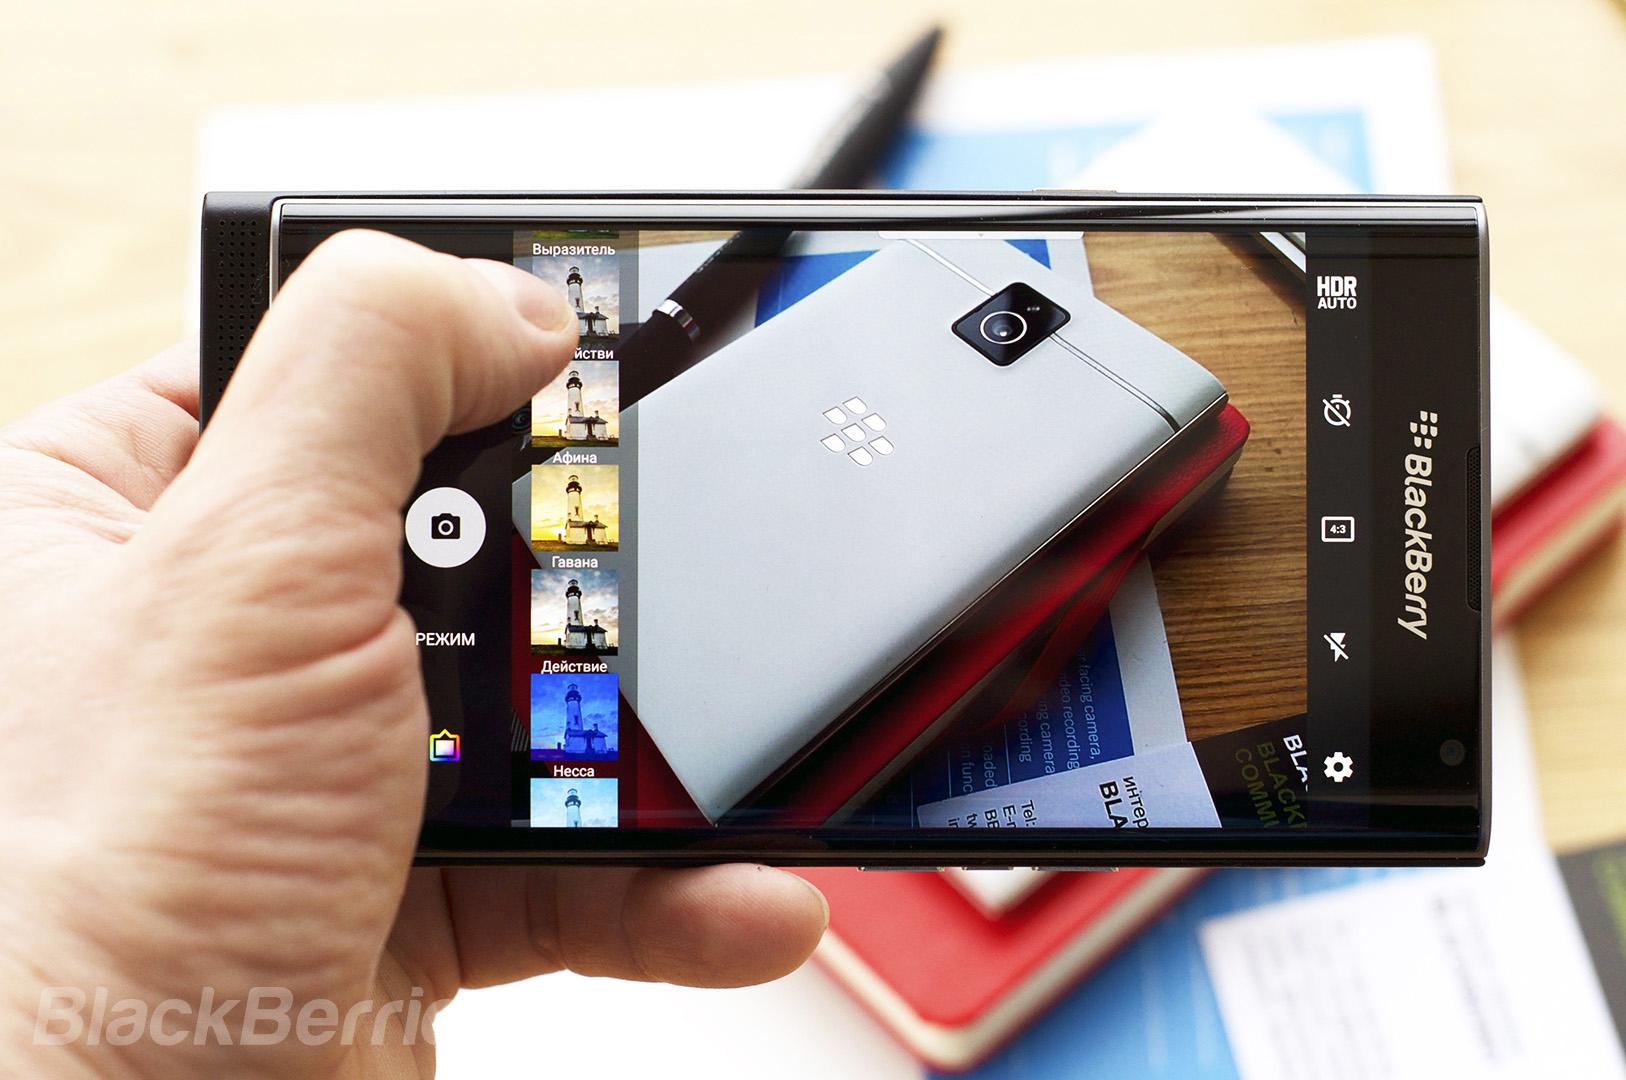 BlackBerry-Priv-Review-134